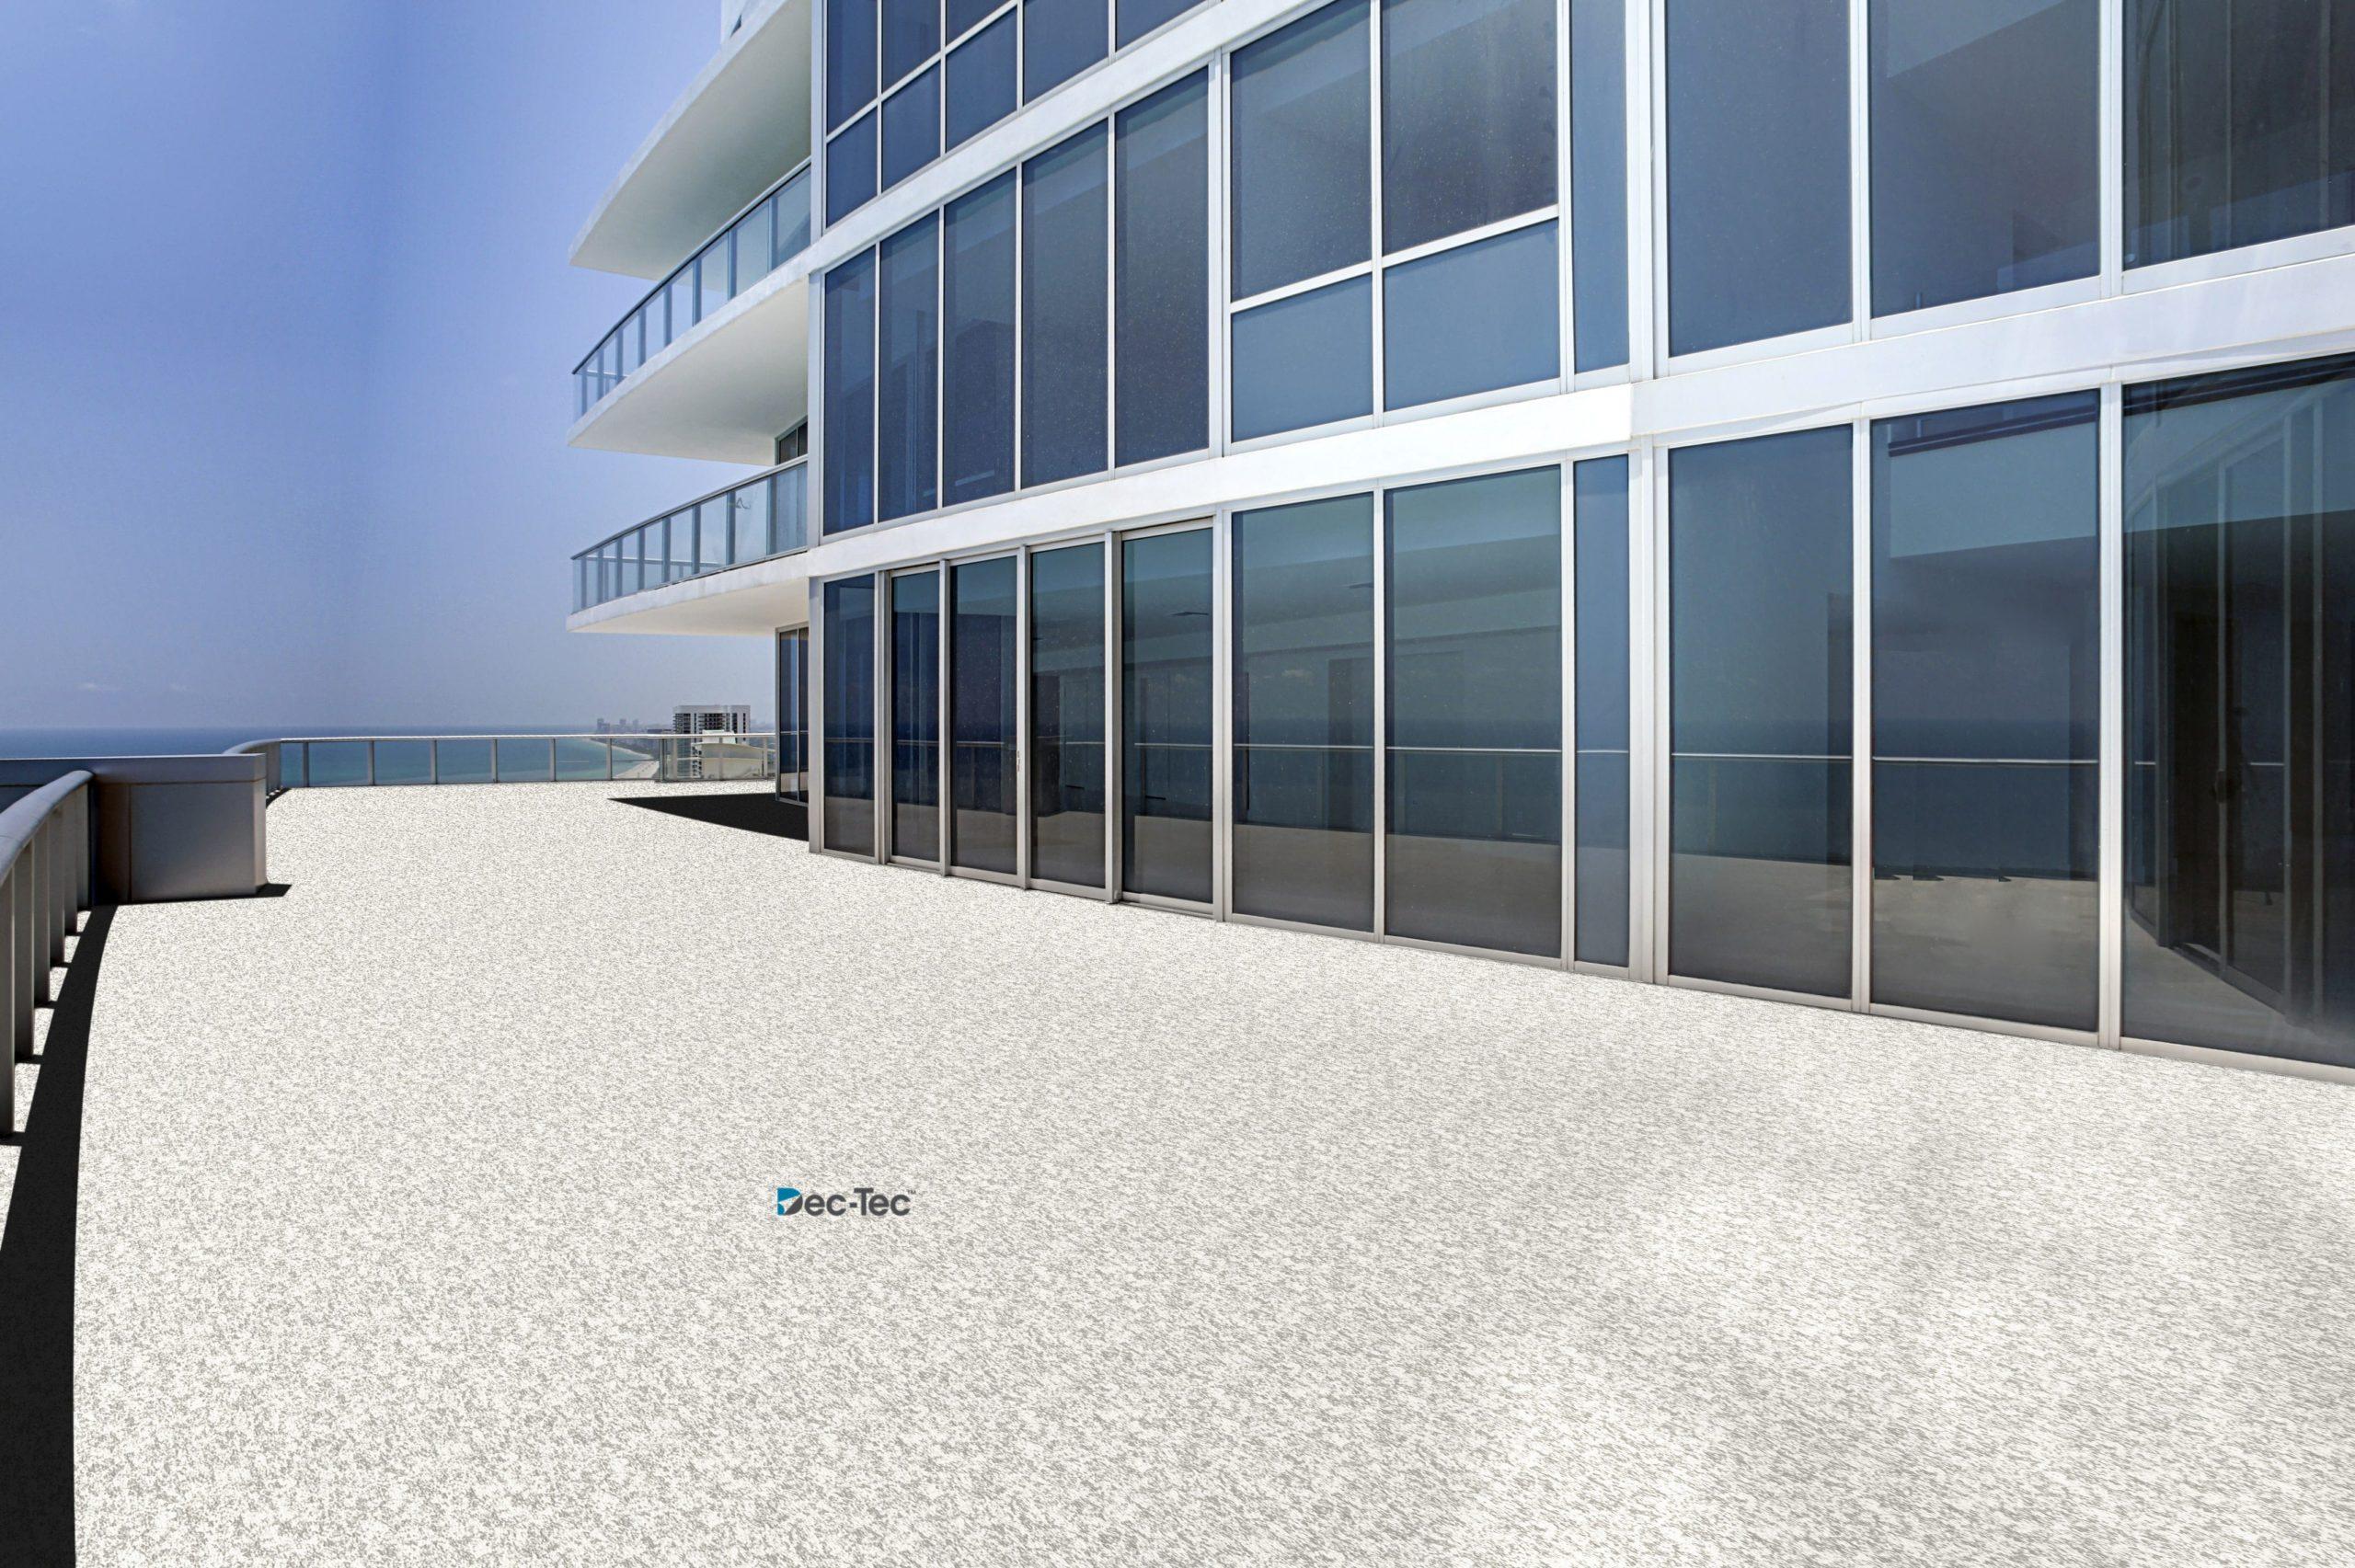 thermoplastic waterproof deck membrane